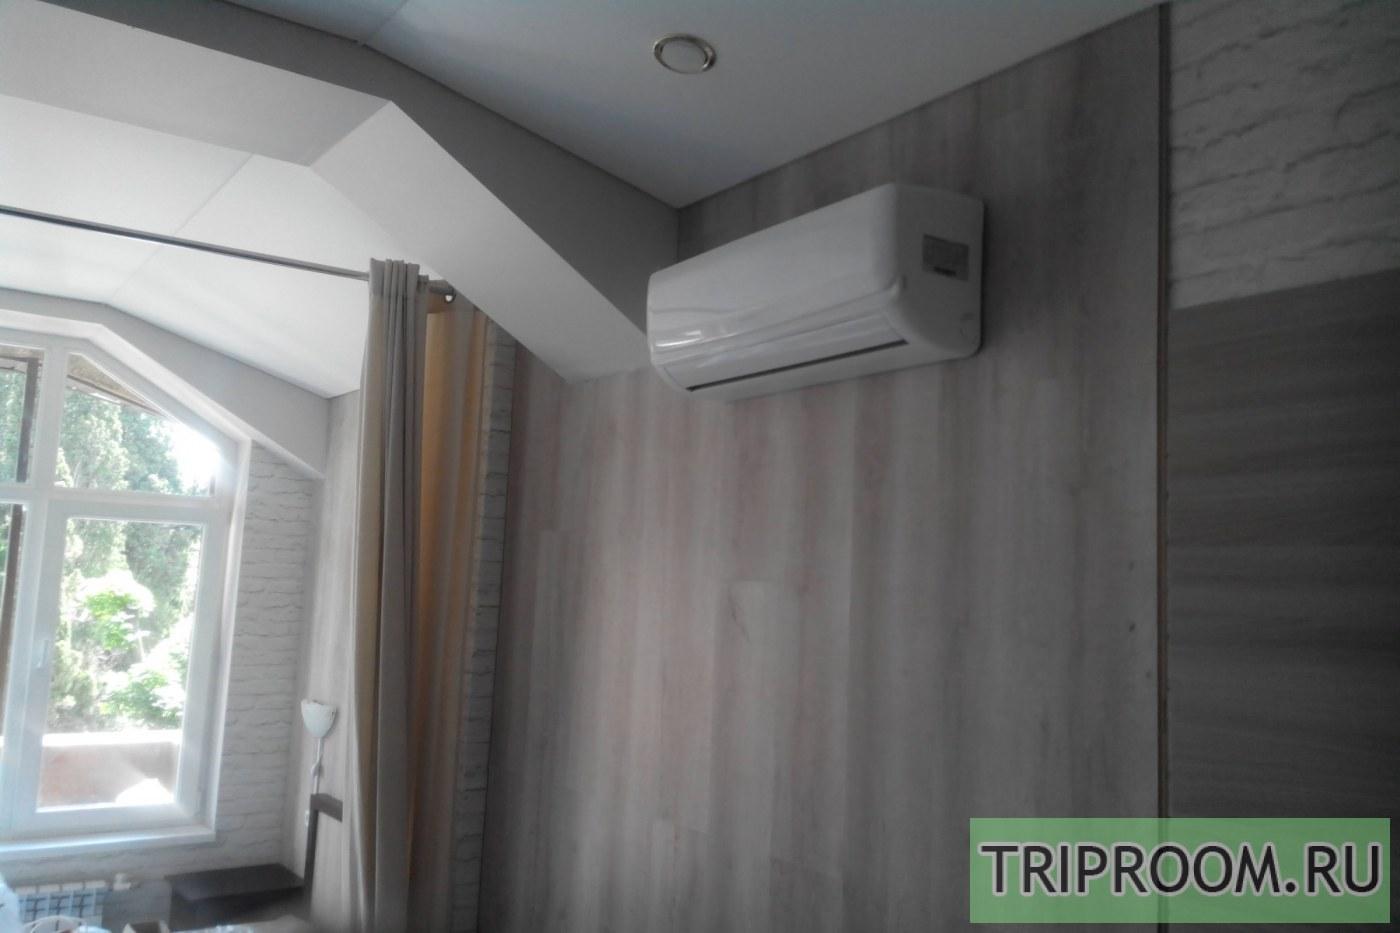 1-комнатная квартира посуточно (вариант № 40268), ул. Дмитриевой улица, фото № 8